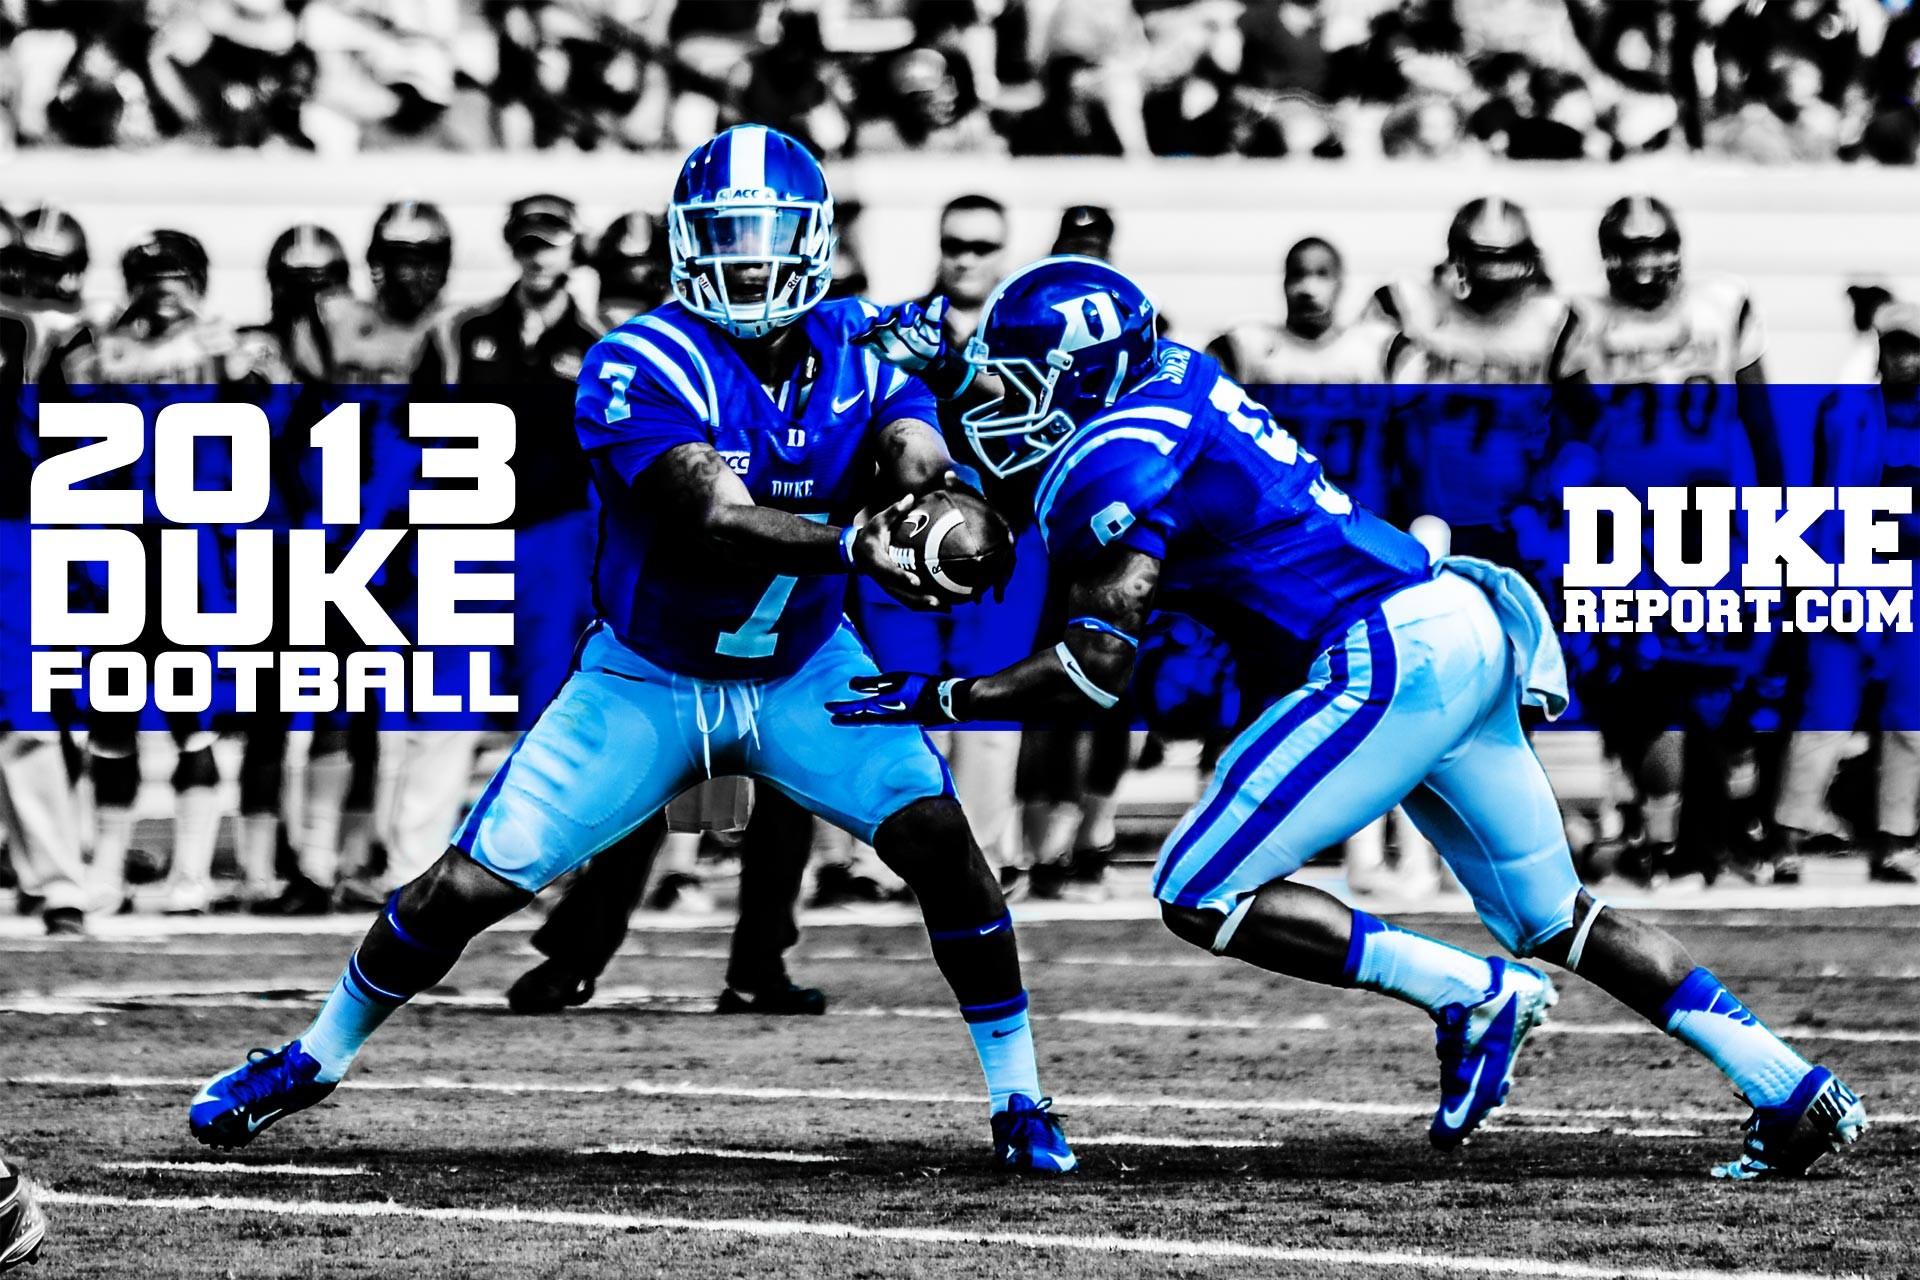 Duke Football Wallpapers